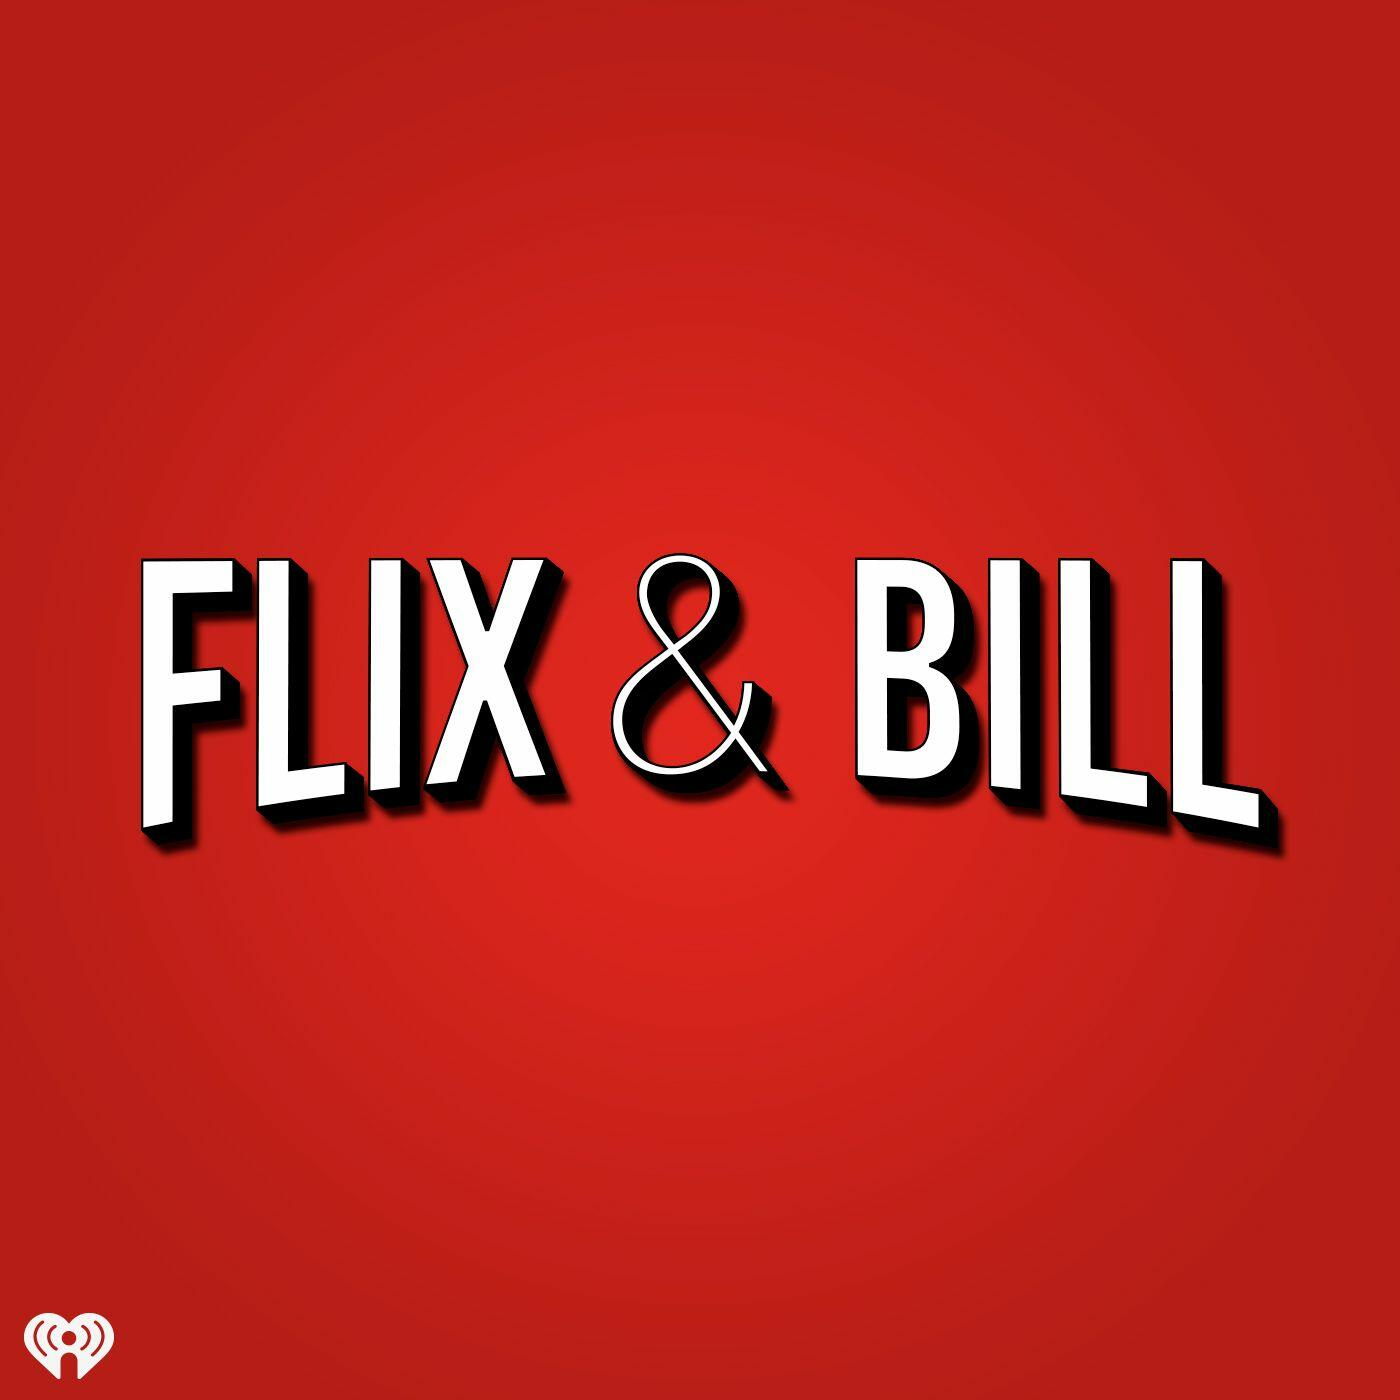 Flix & Bill